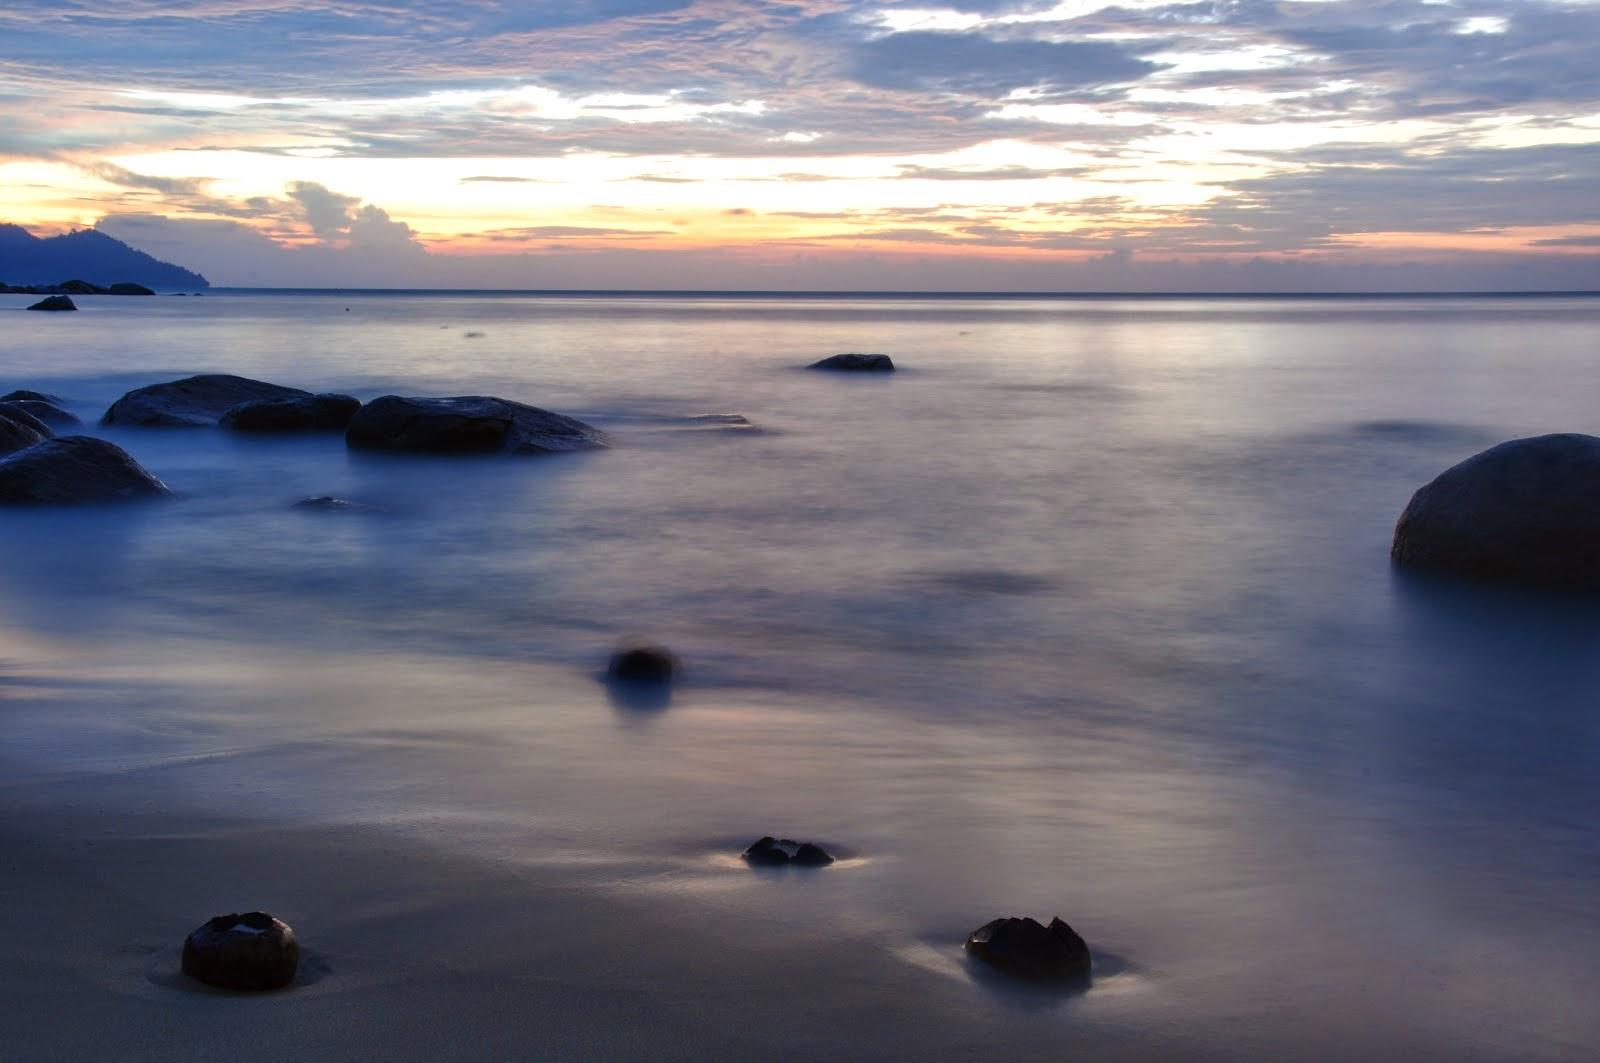 Pantai Kura Kalimantan Barat Holiday Keindahan Lainnya Sebuah Bukit Kita